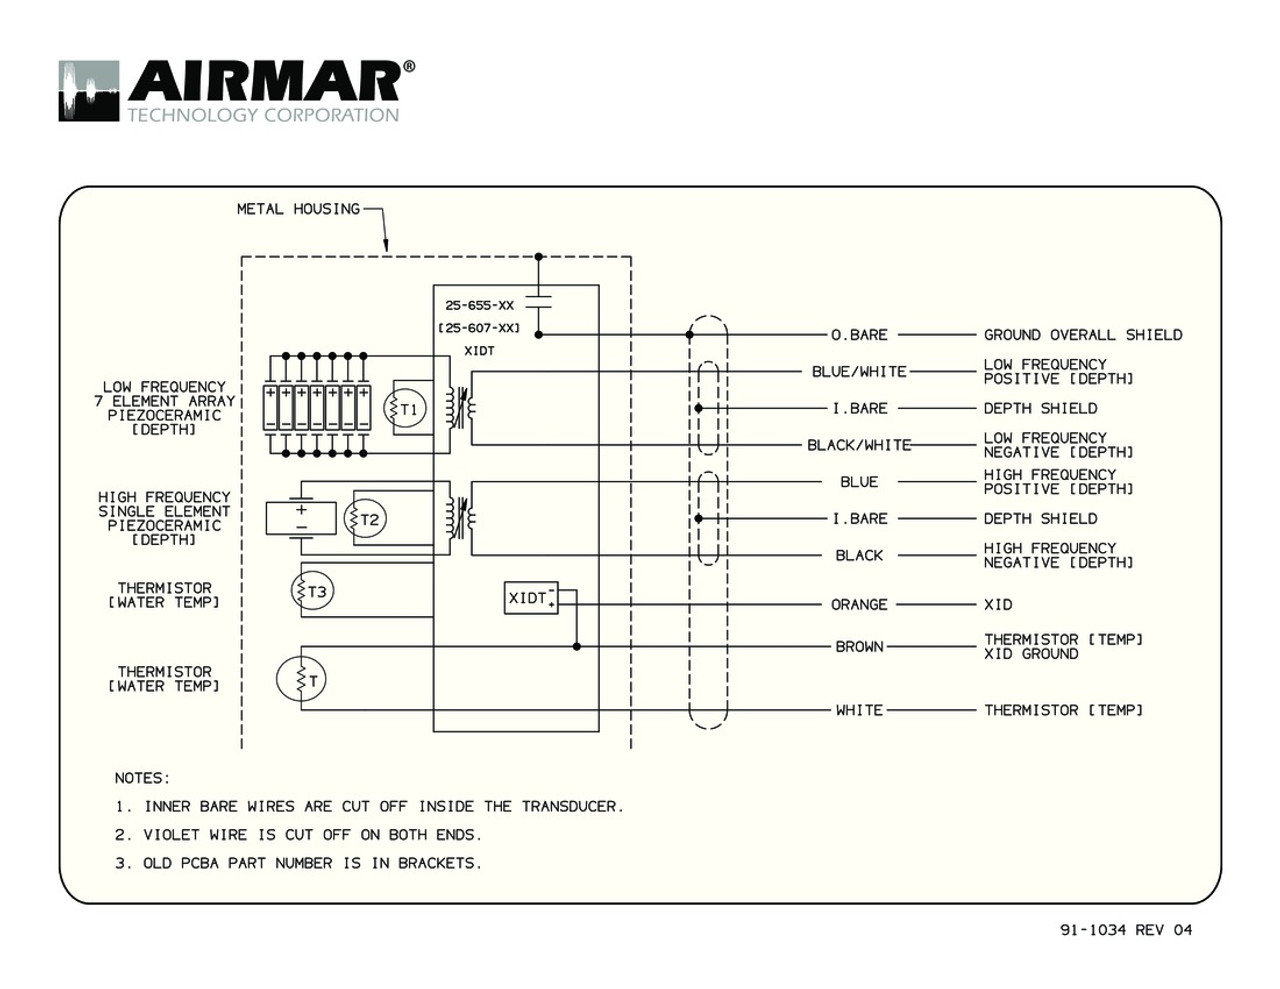 small resolution of airmar wiring diagram b265 b275 blue bottle marine pressure transducer wiring diagram b265c lh